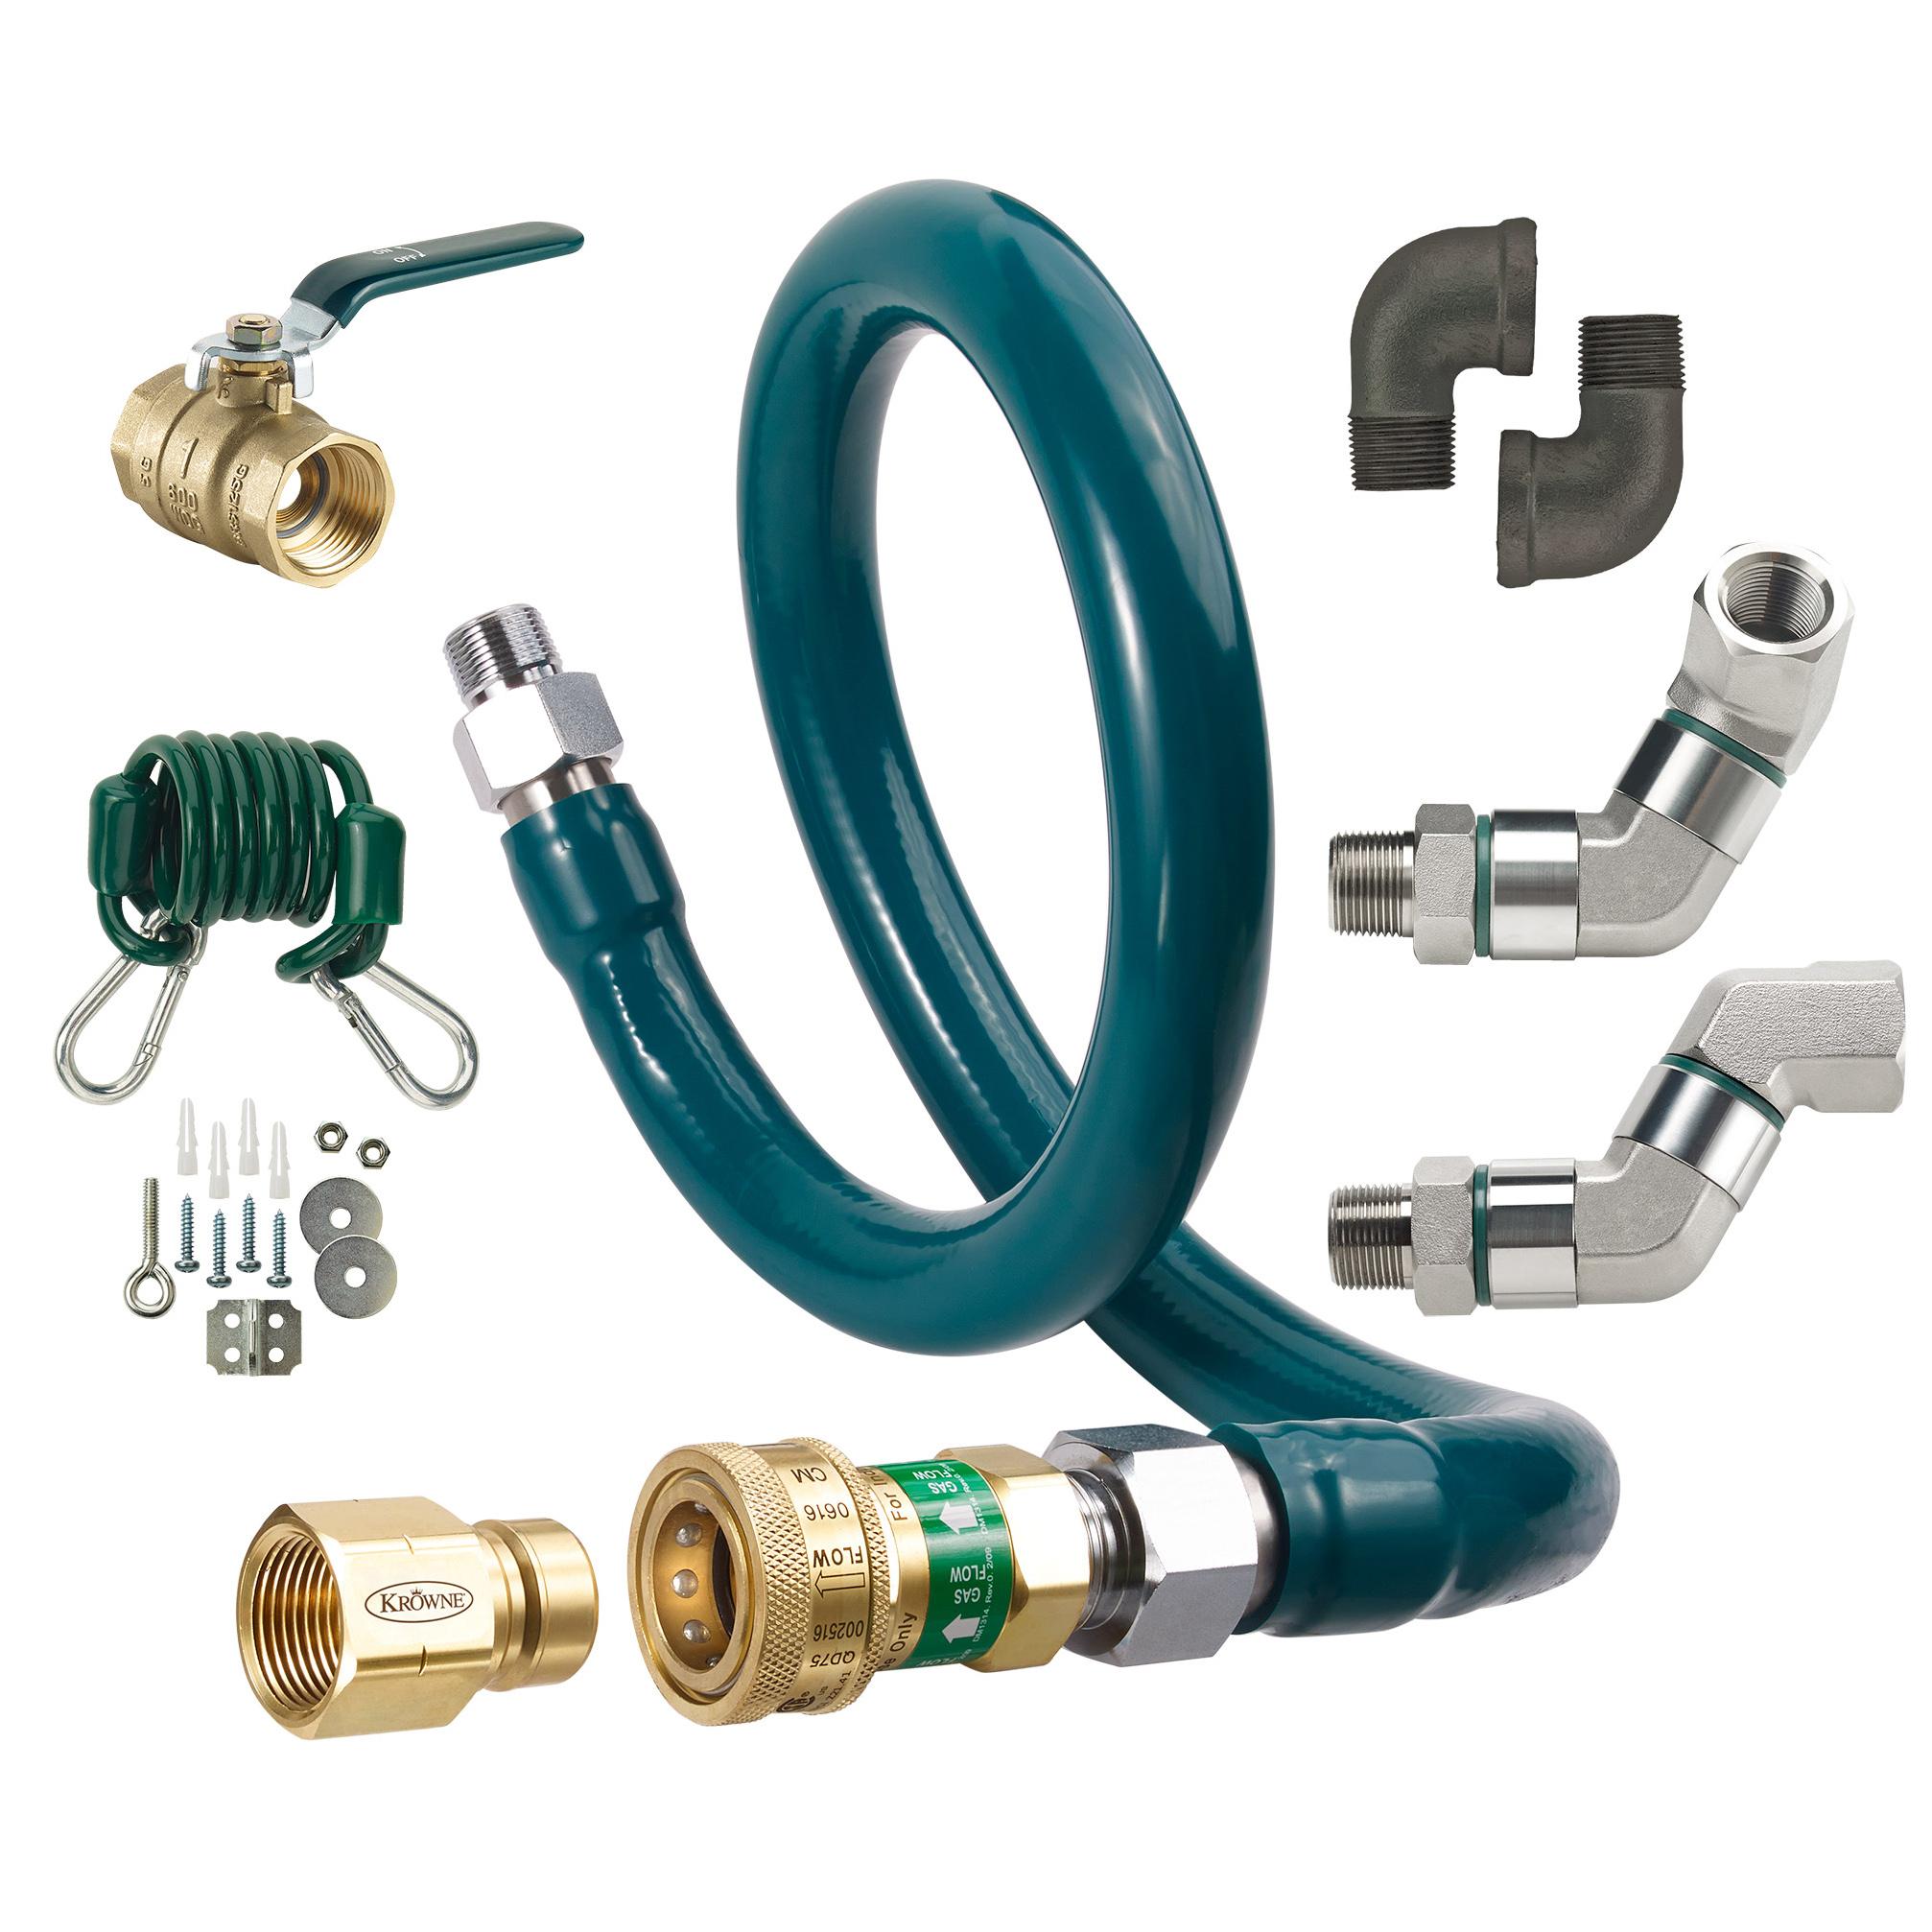 Krowne Metal M10060K10 gas connector hose kit